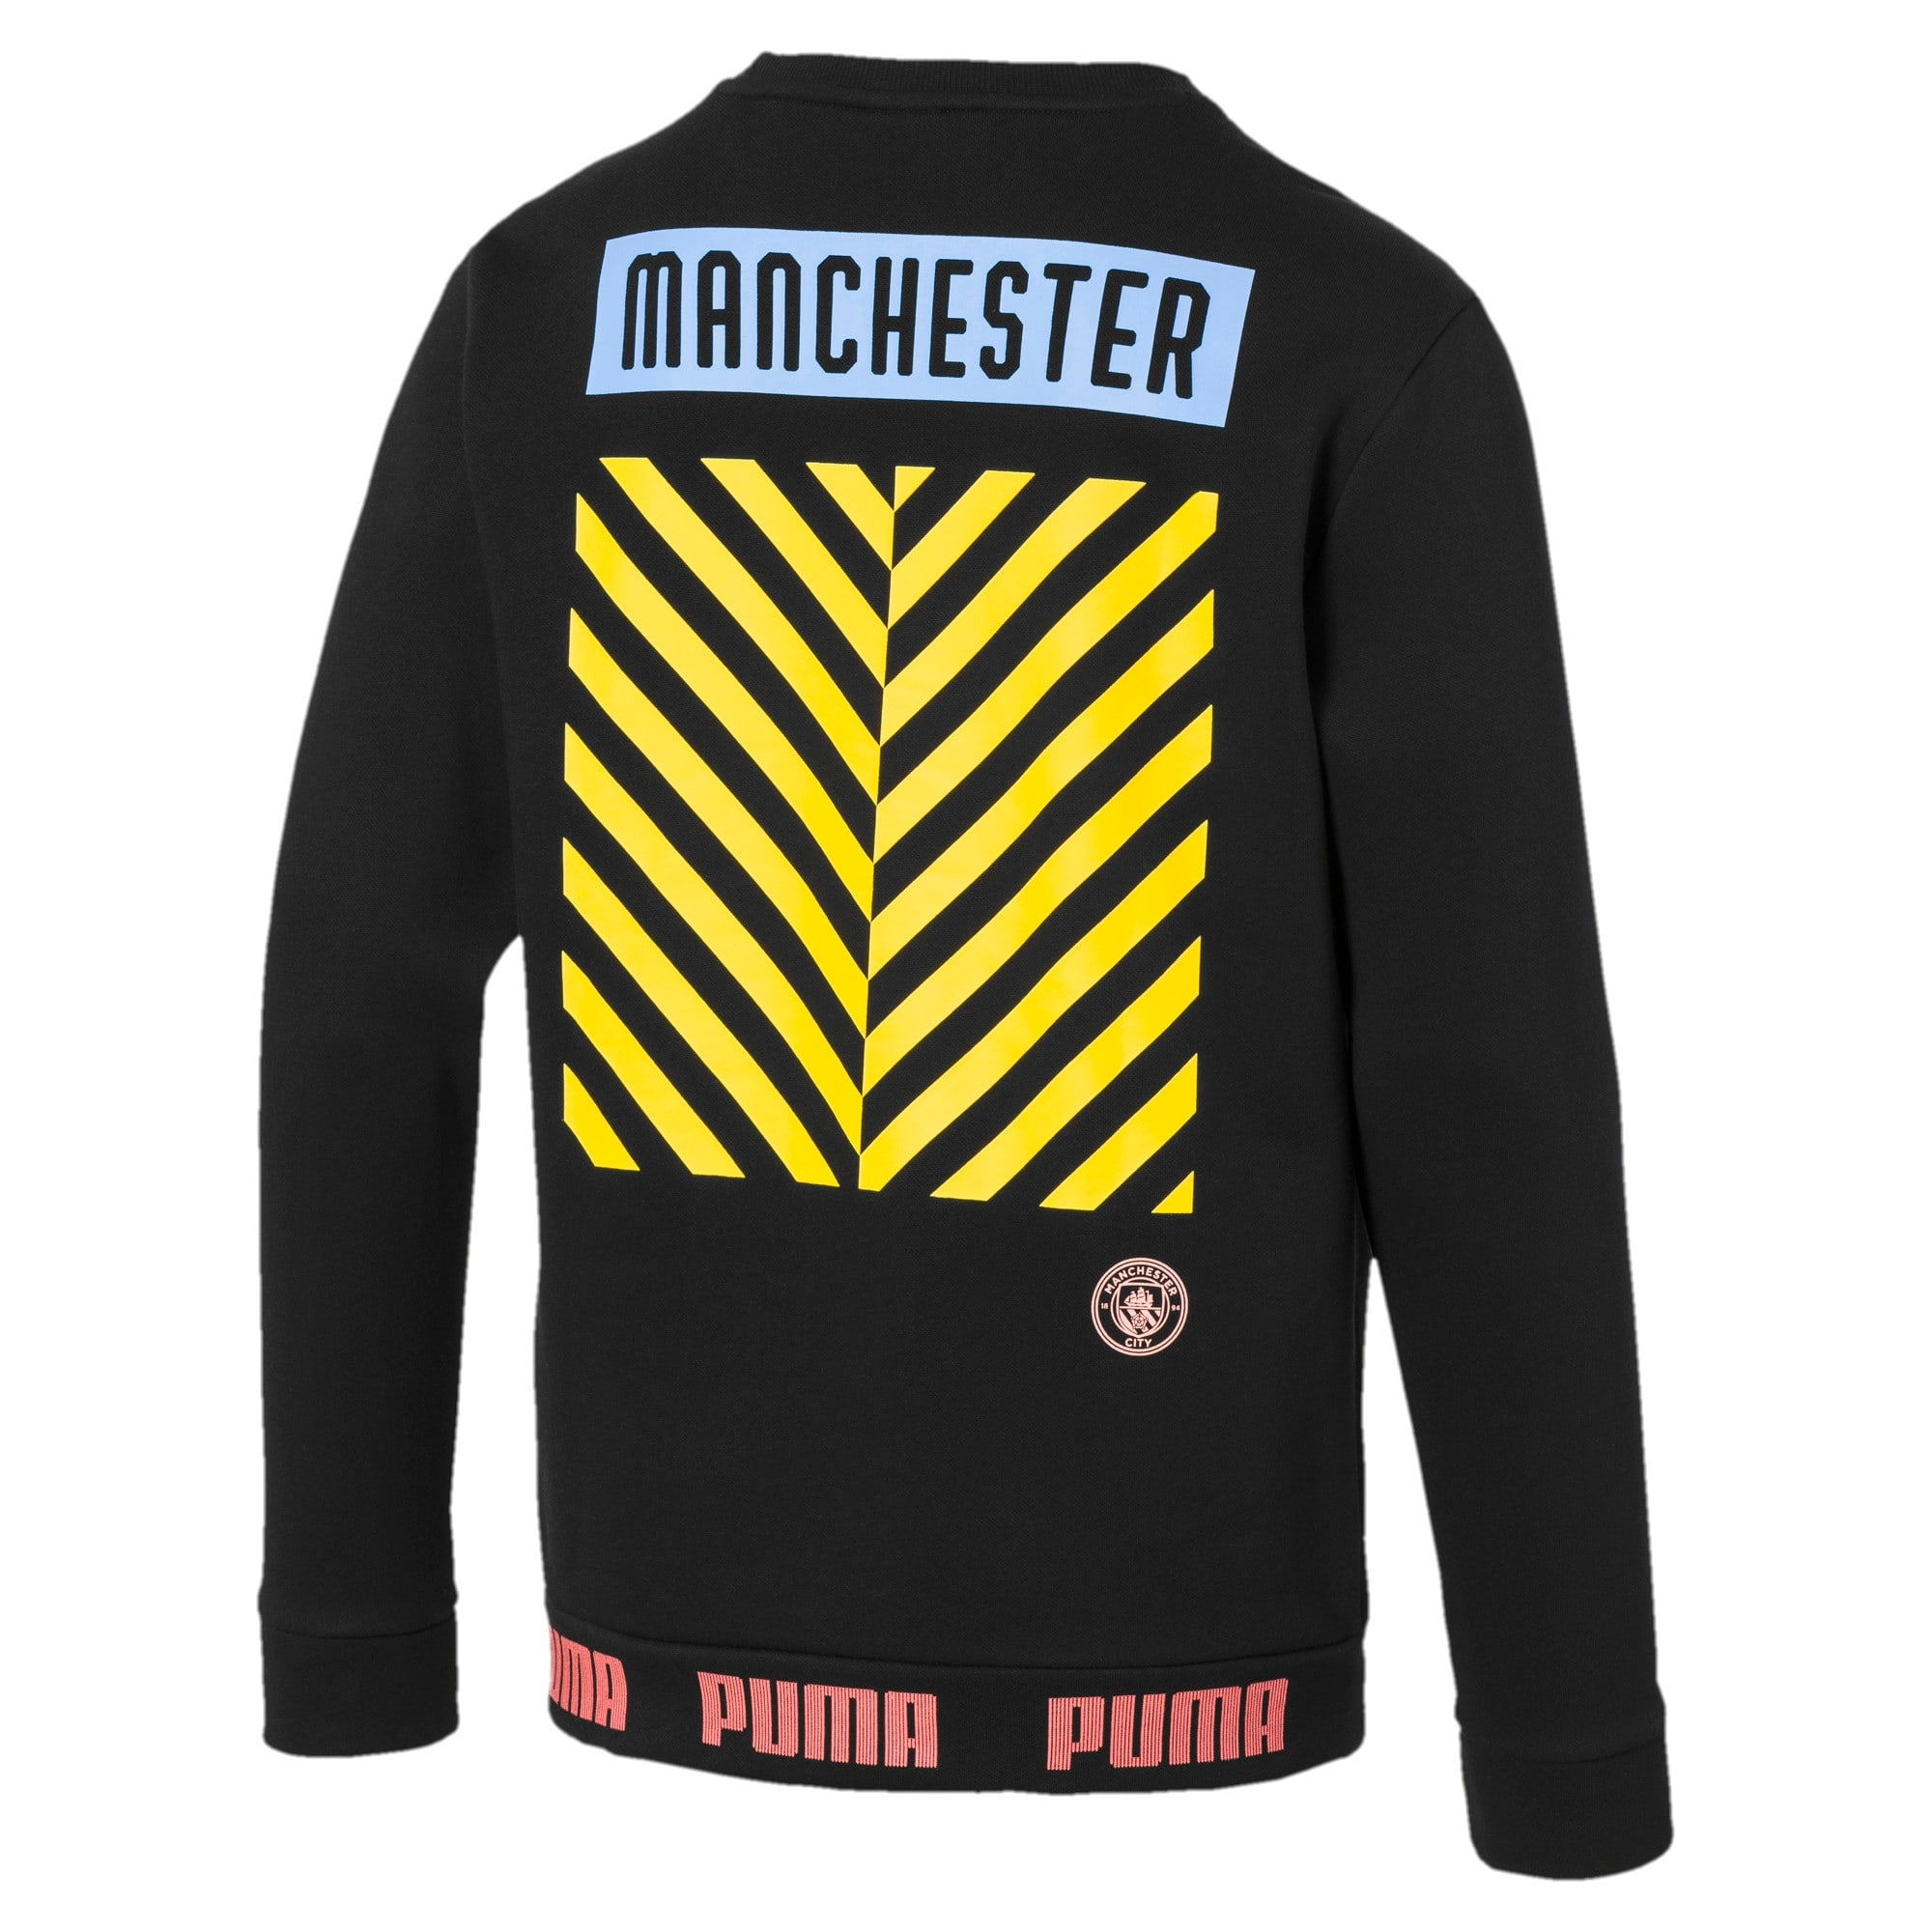 Thumbnail 2 of Manchester City FC FtblCulture Men's Sweatshirt, Puma Black-Georgia Peach, medium